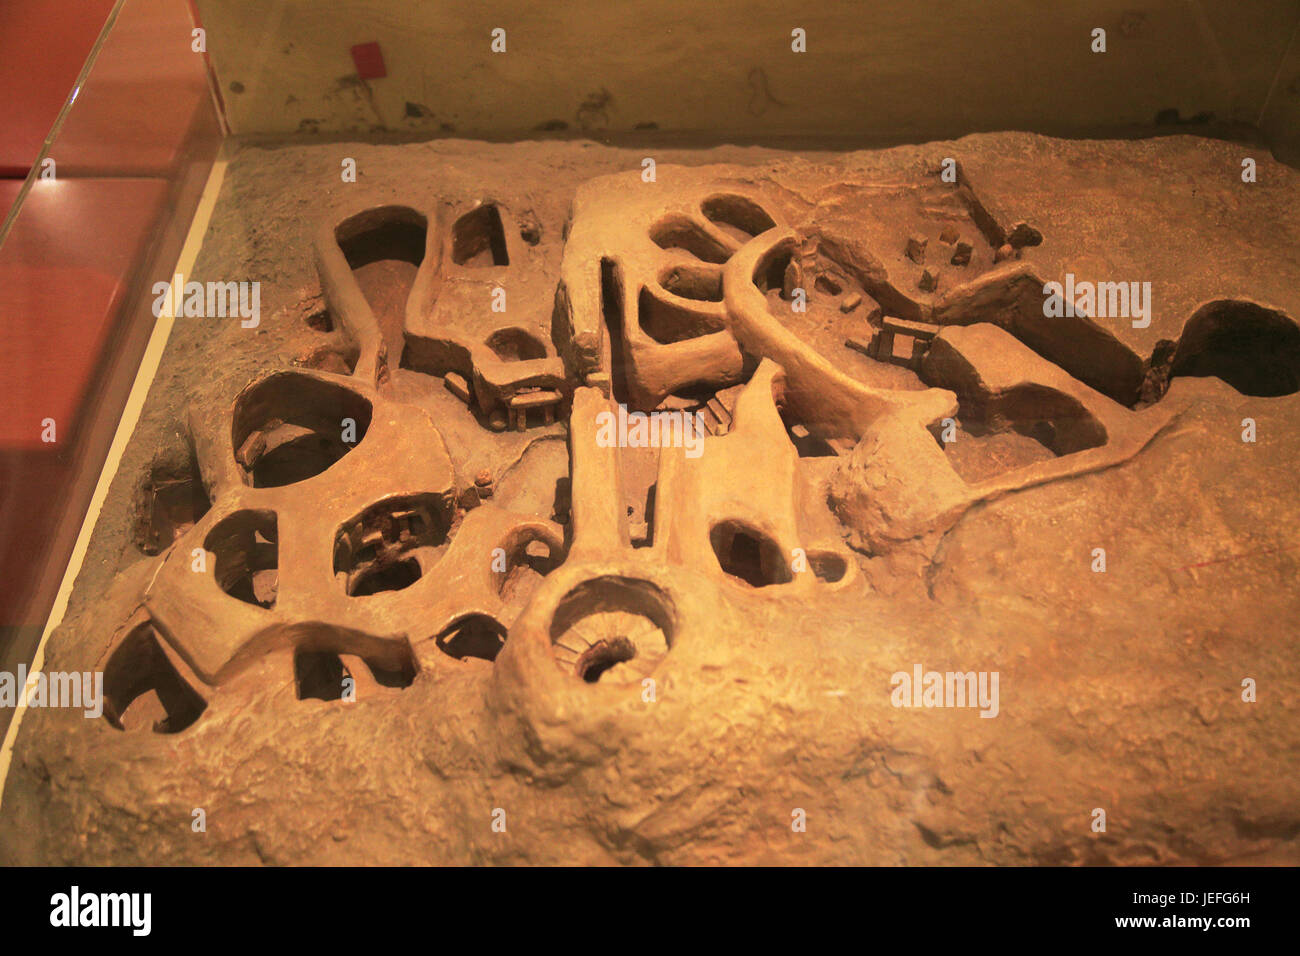 Hal saflieni hypogeum model layout in national museum of